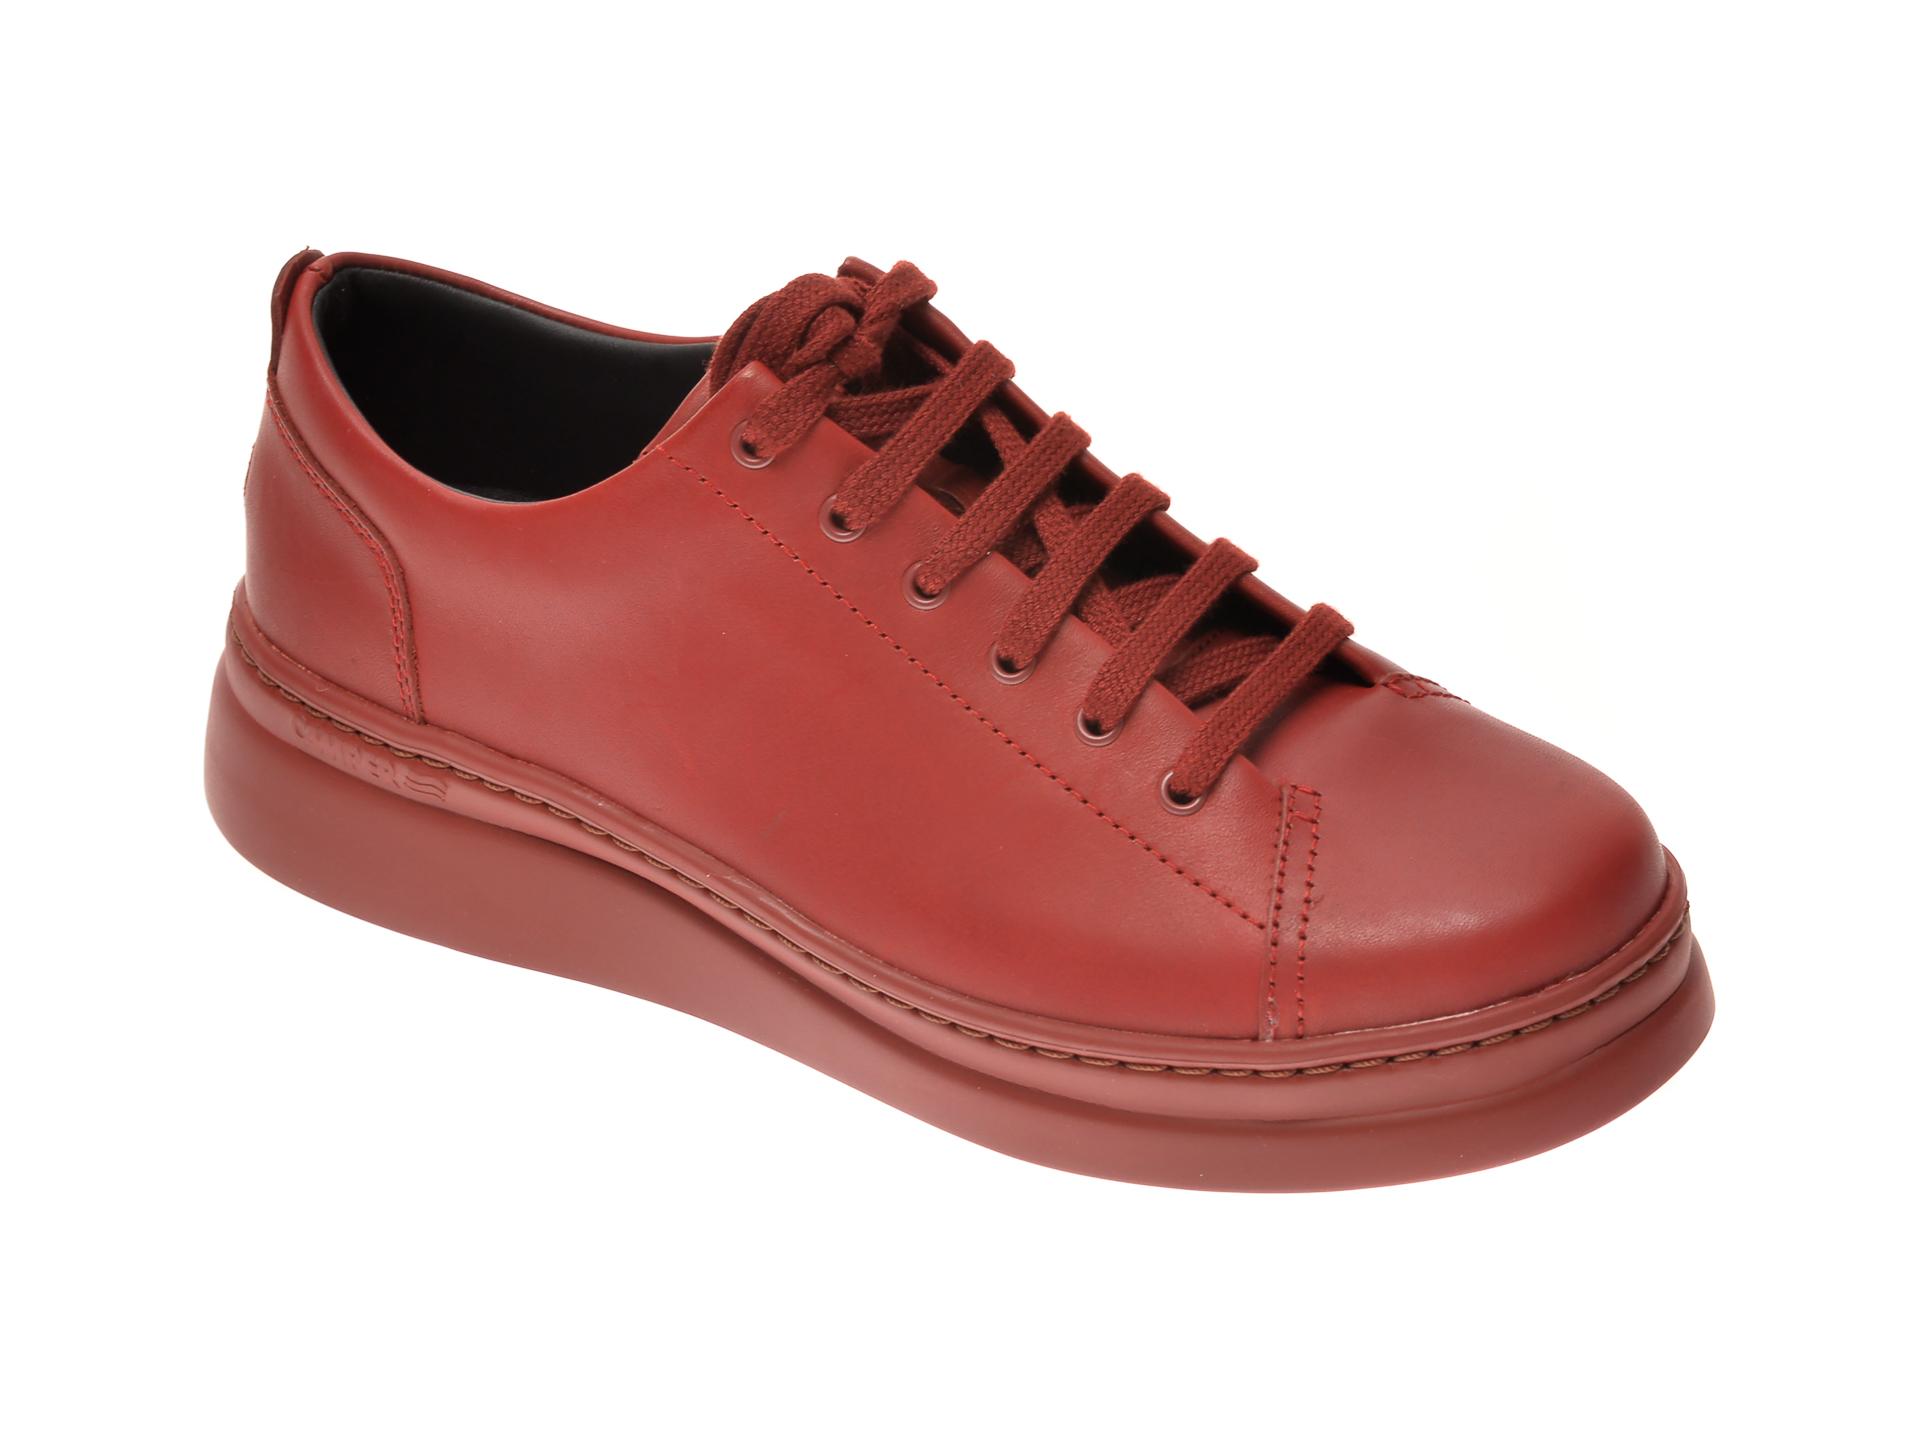 Pantofi CAMPER visinii, K200645, din piele naturala imagine